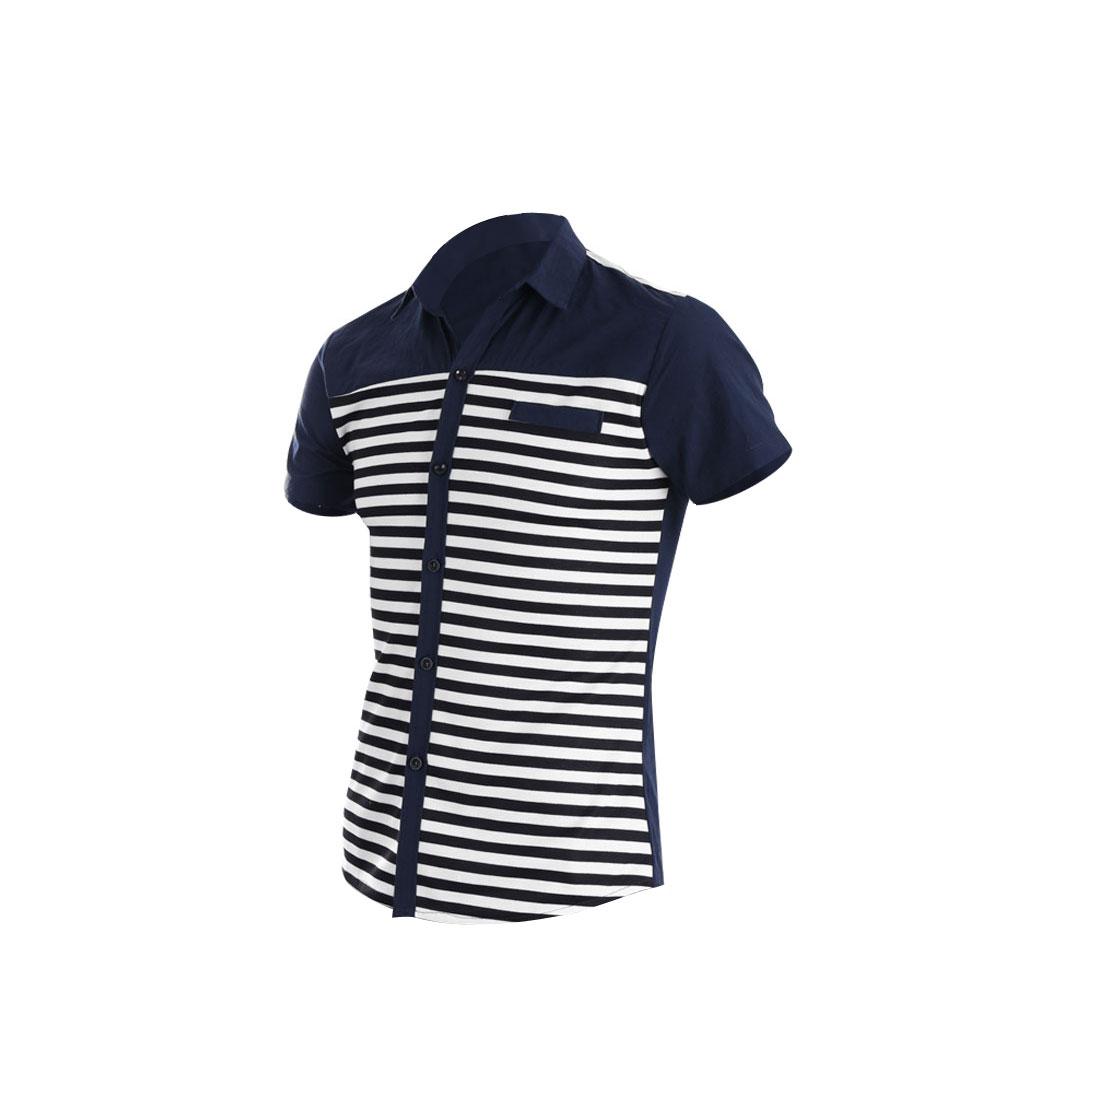 Man Korean Style Short Sleeve Point Collar Shirt Navy Blue S